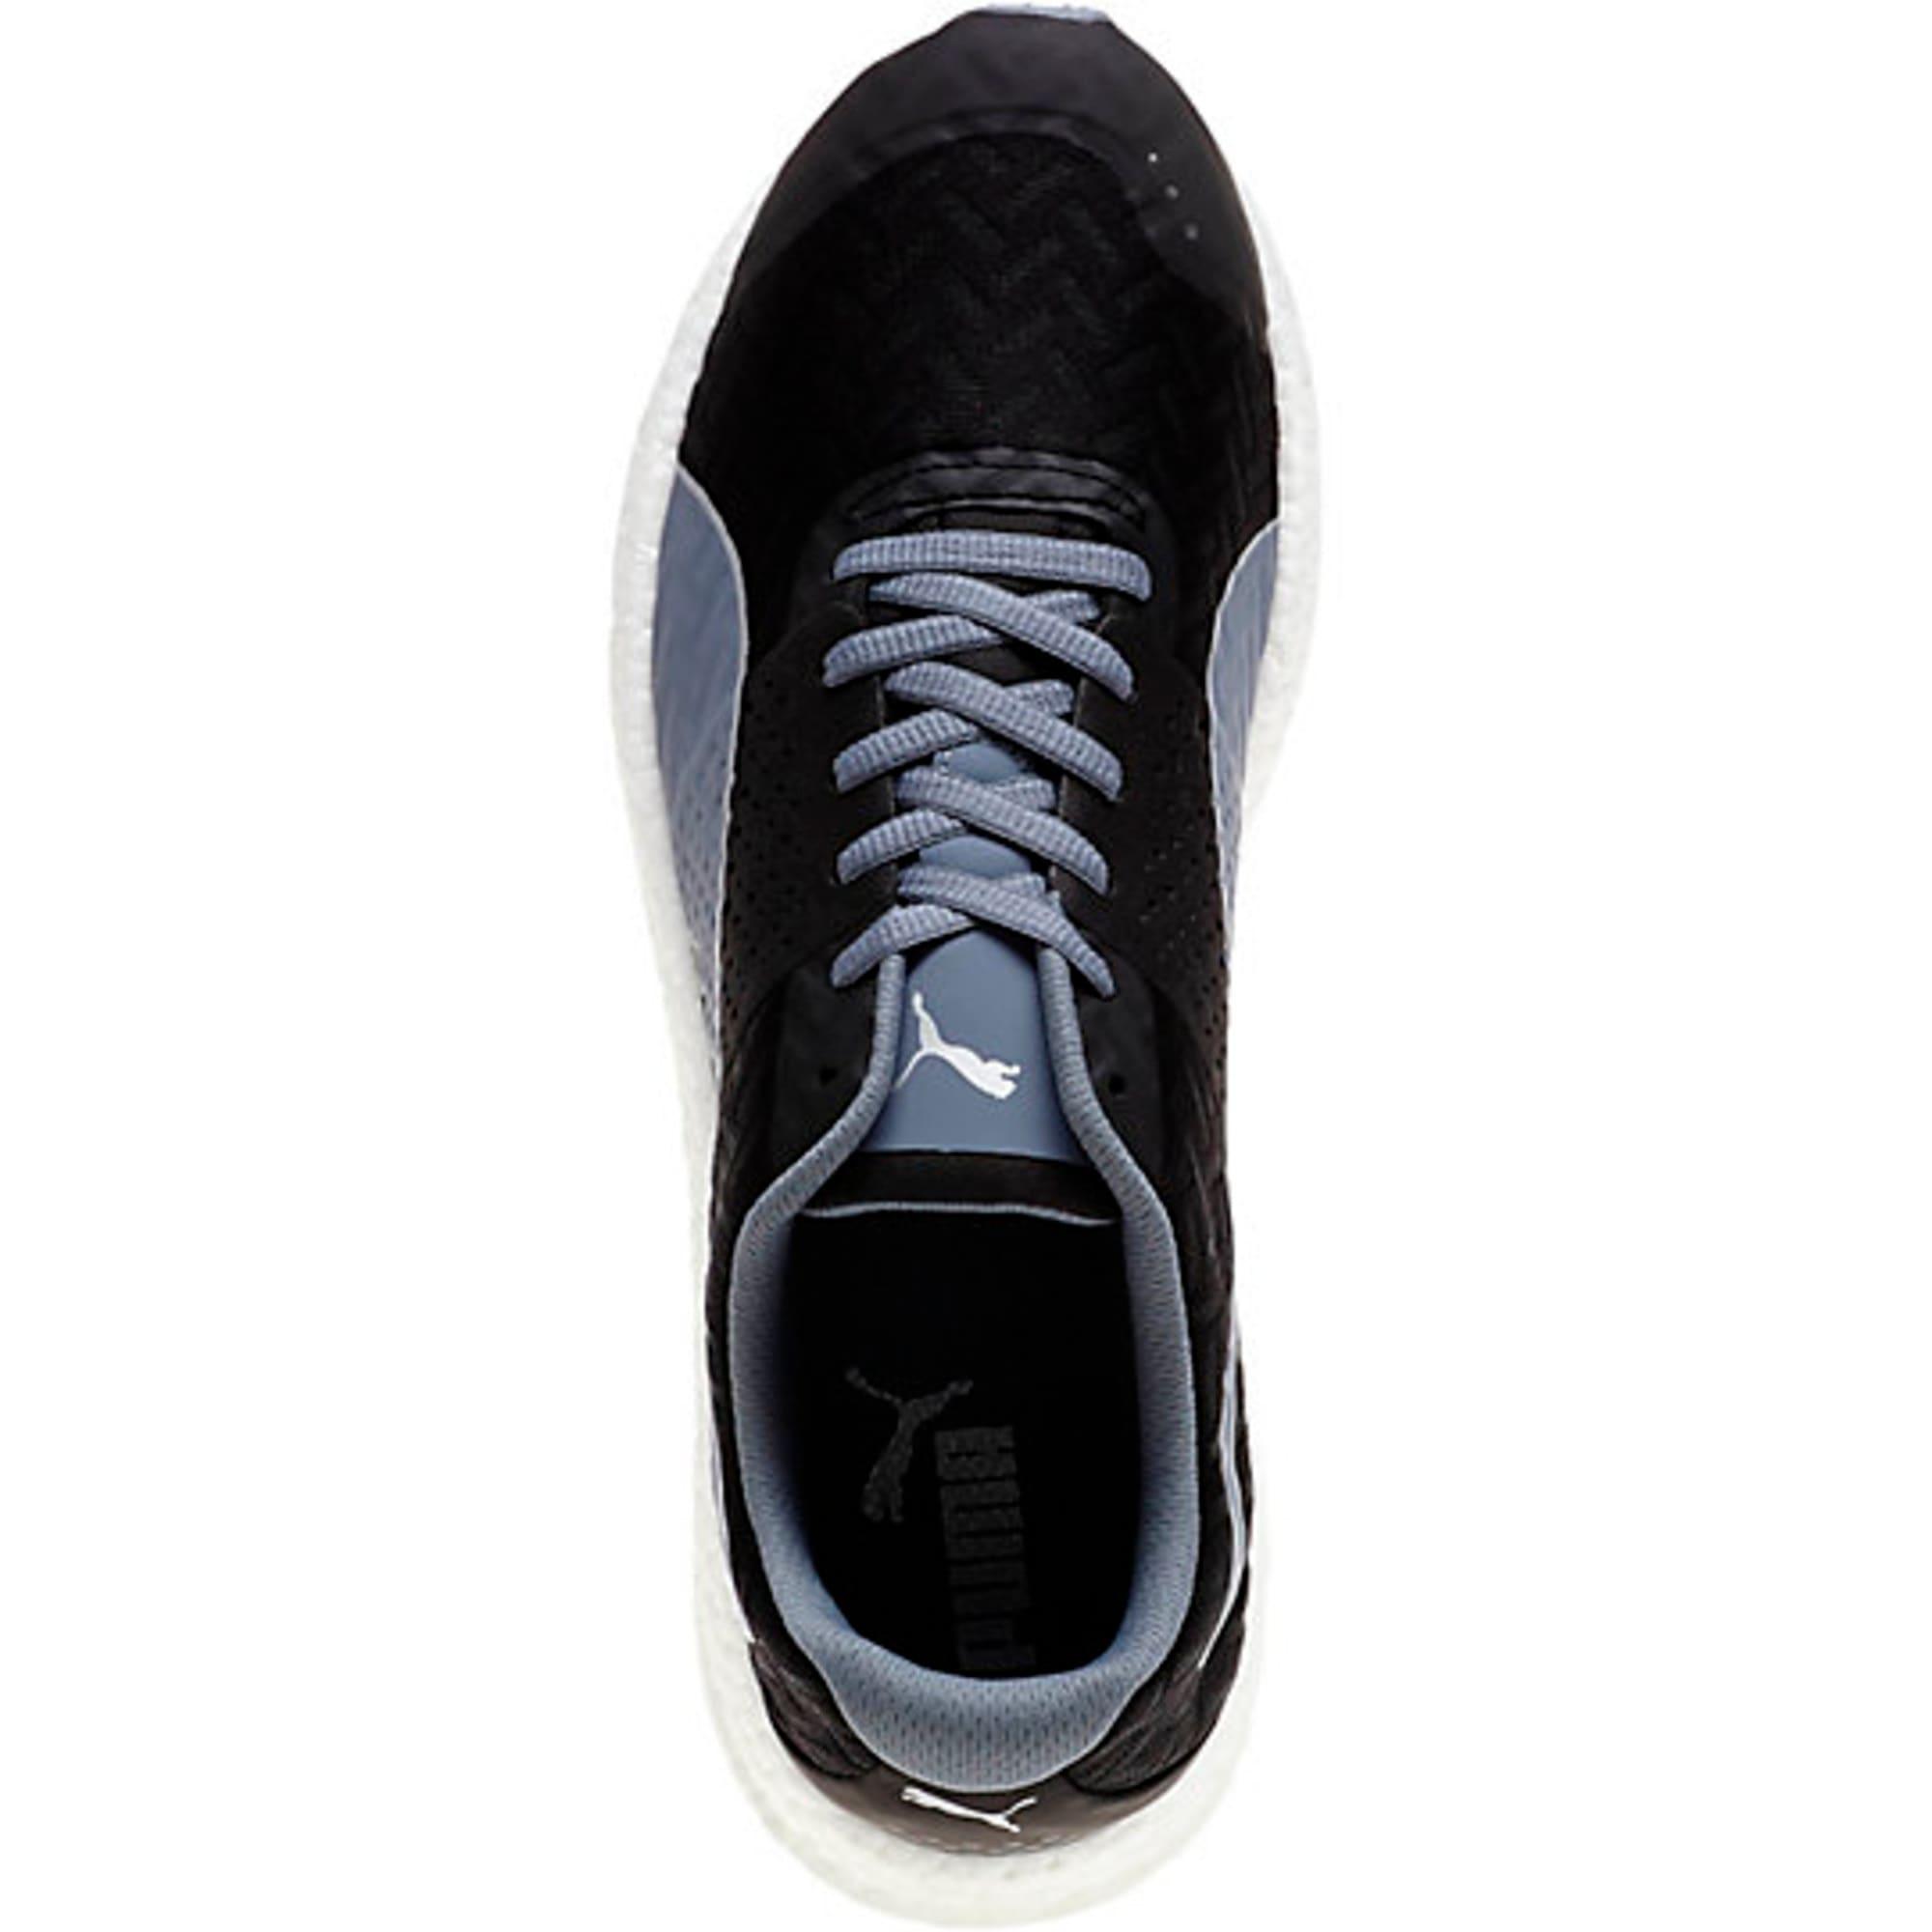 Thumbnail 2 of NRGY Running Shoes, black-folkstone gray, medium-IND